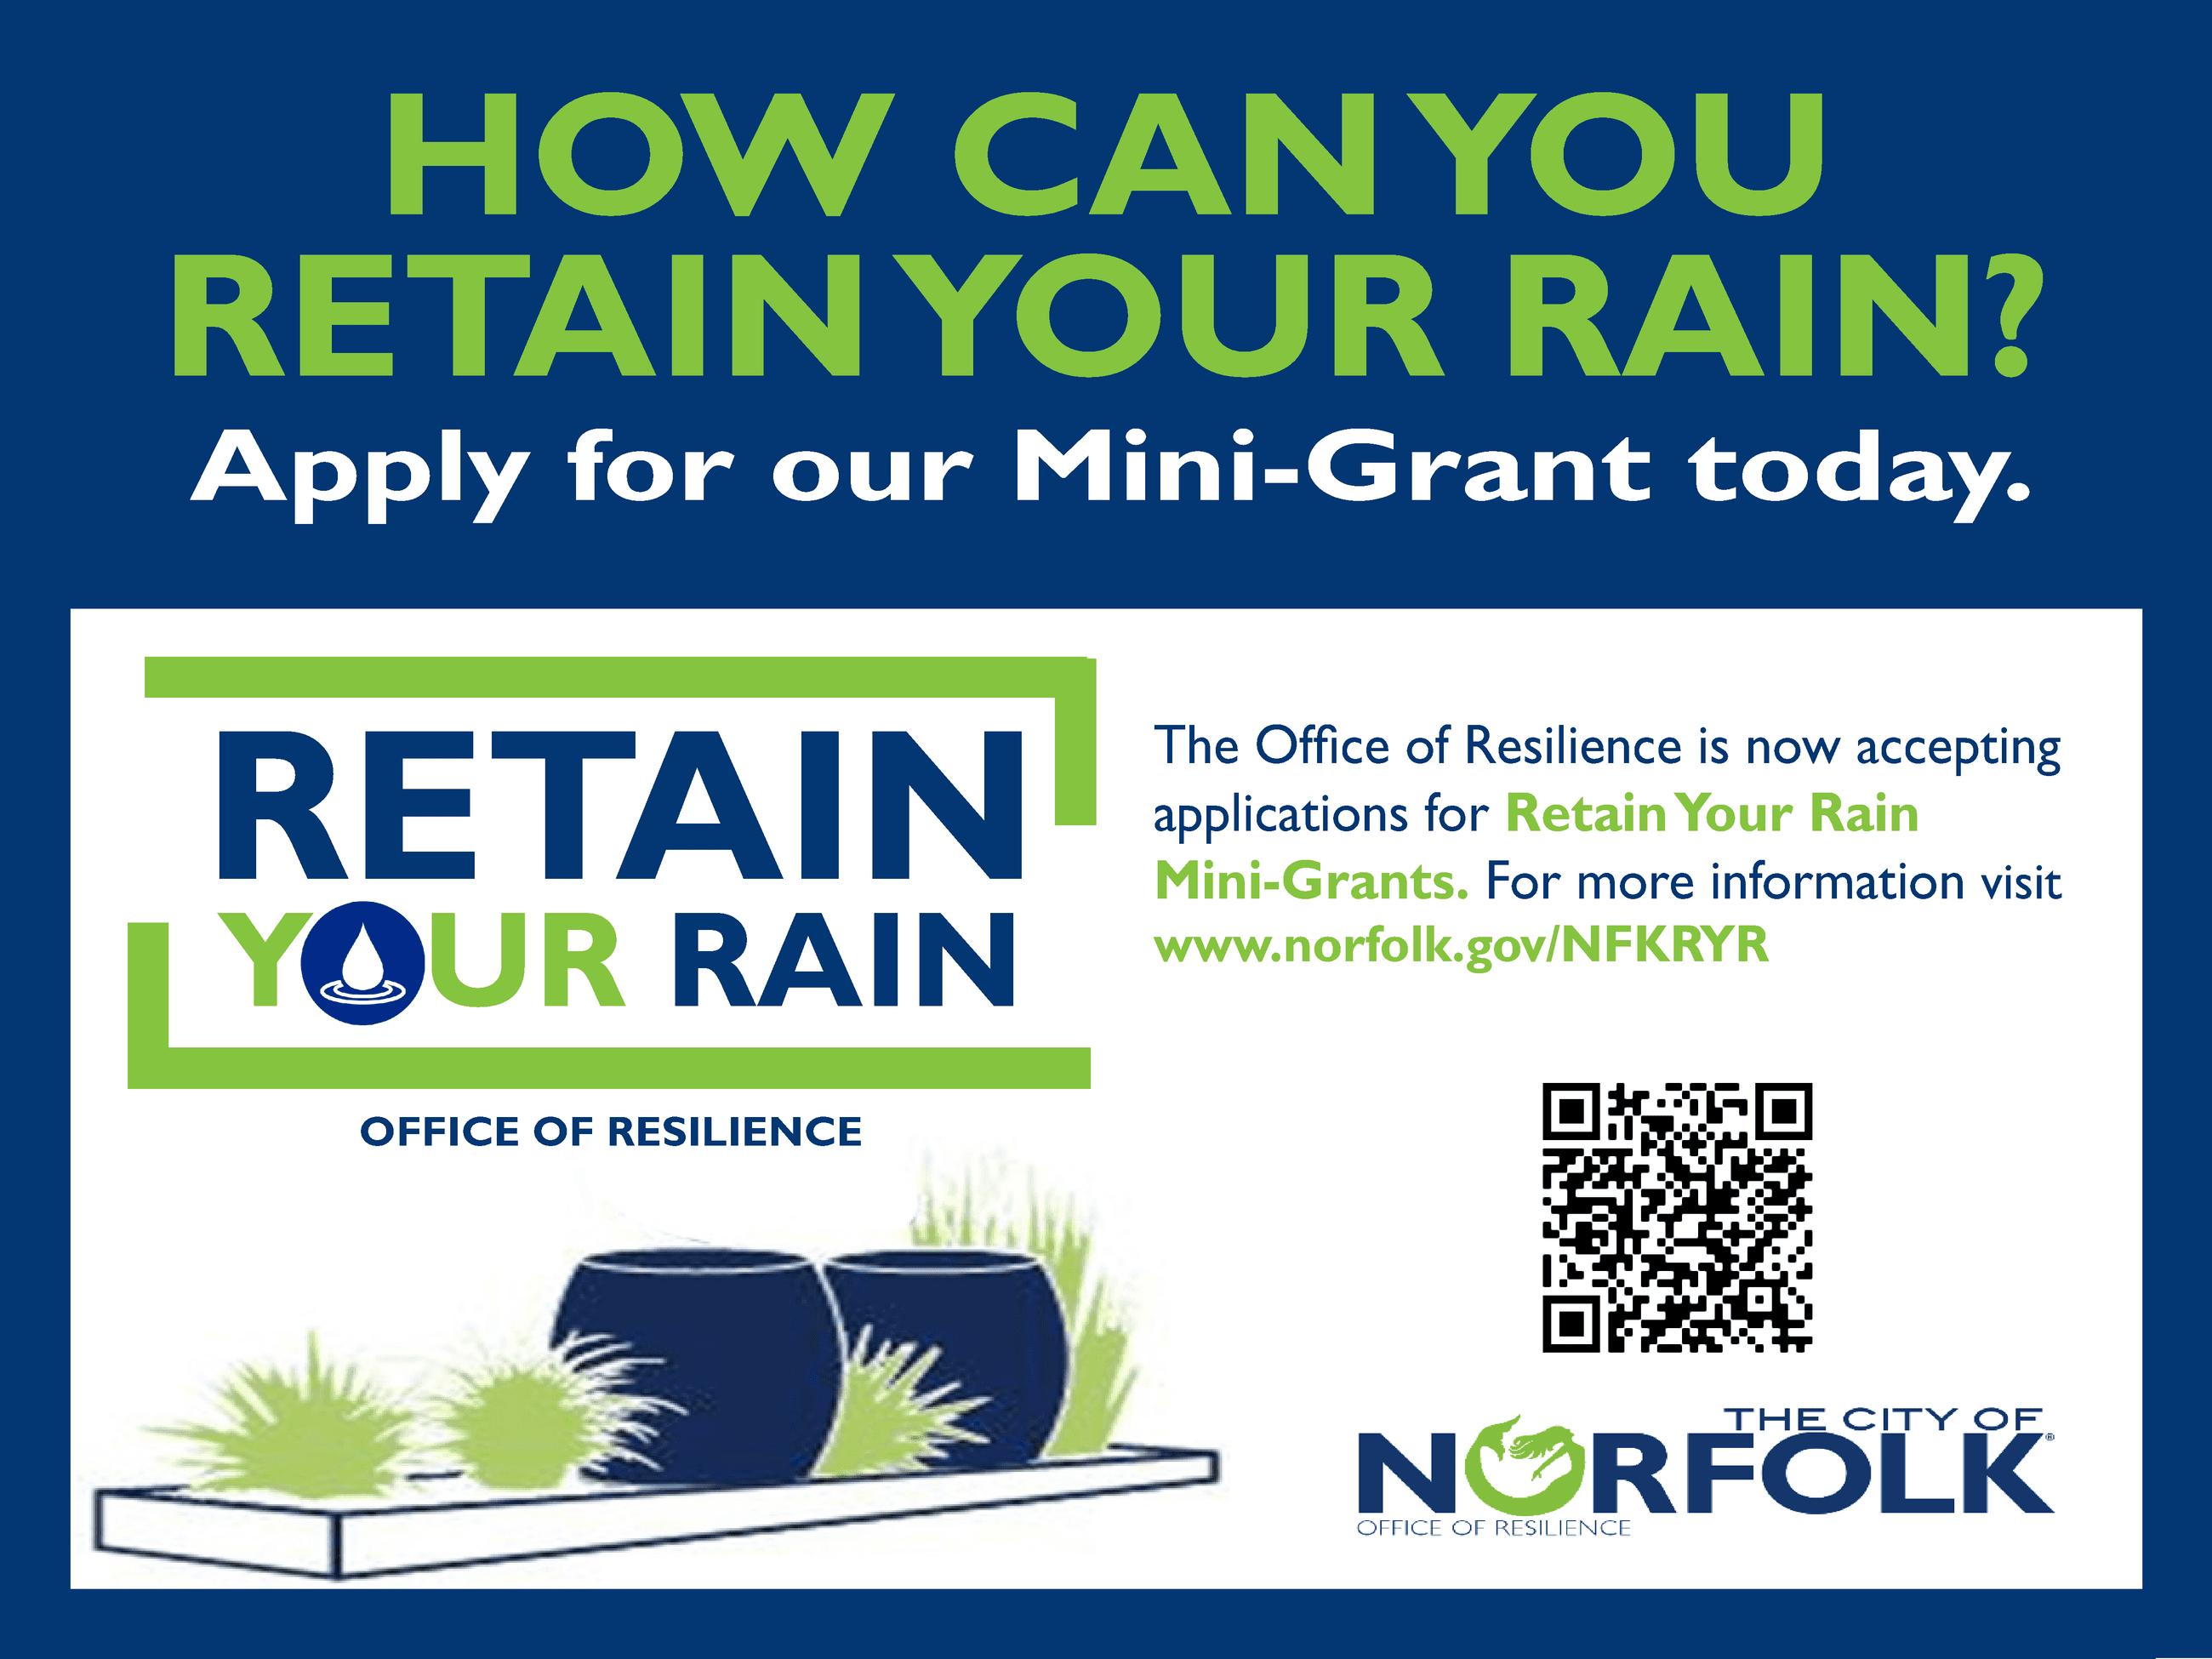 Retain Your Rain Mini Grant